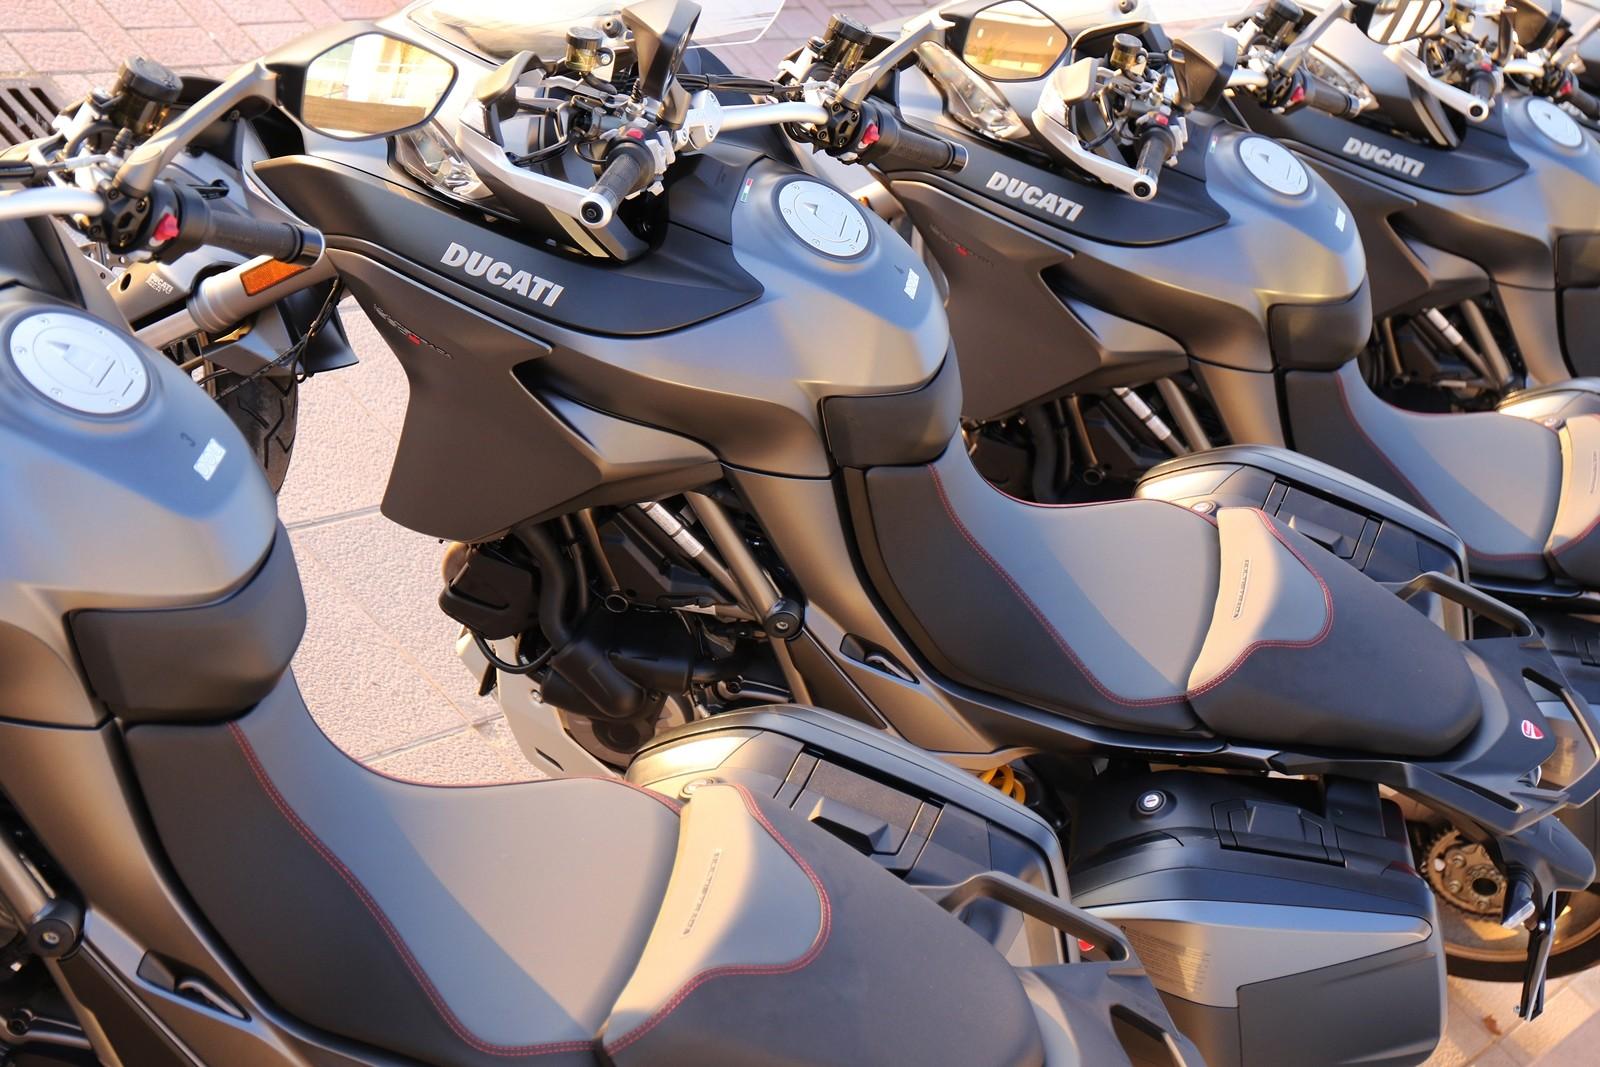 Foto de Ducati Multistrada 1260 2018 prueba (17/21)